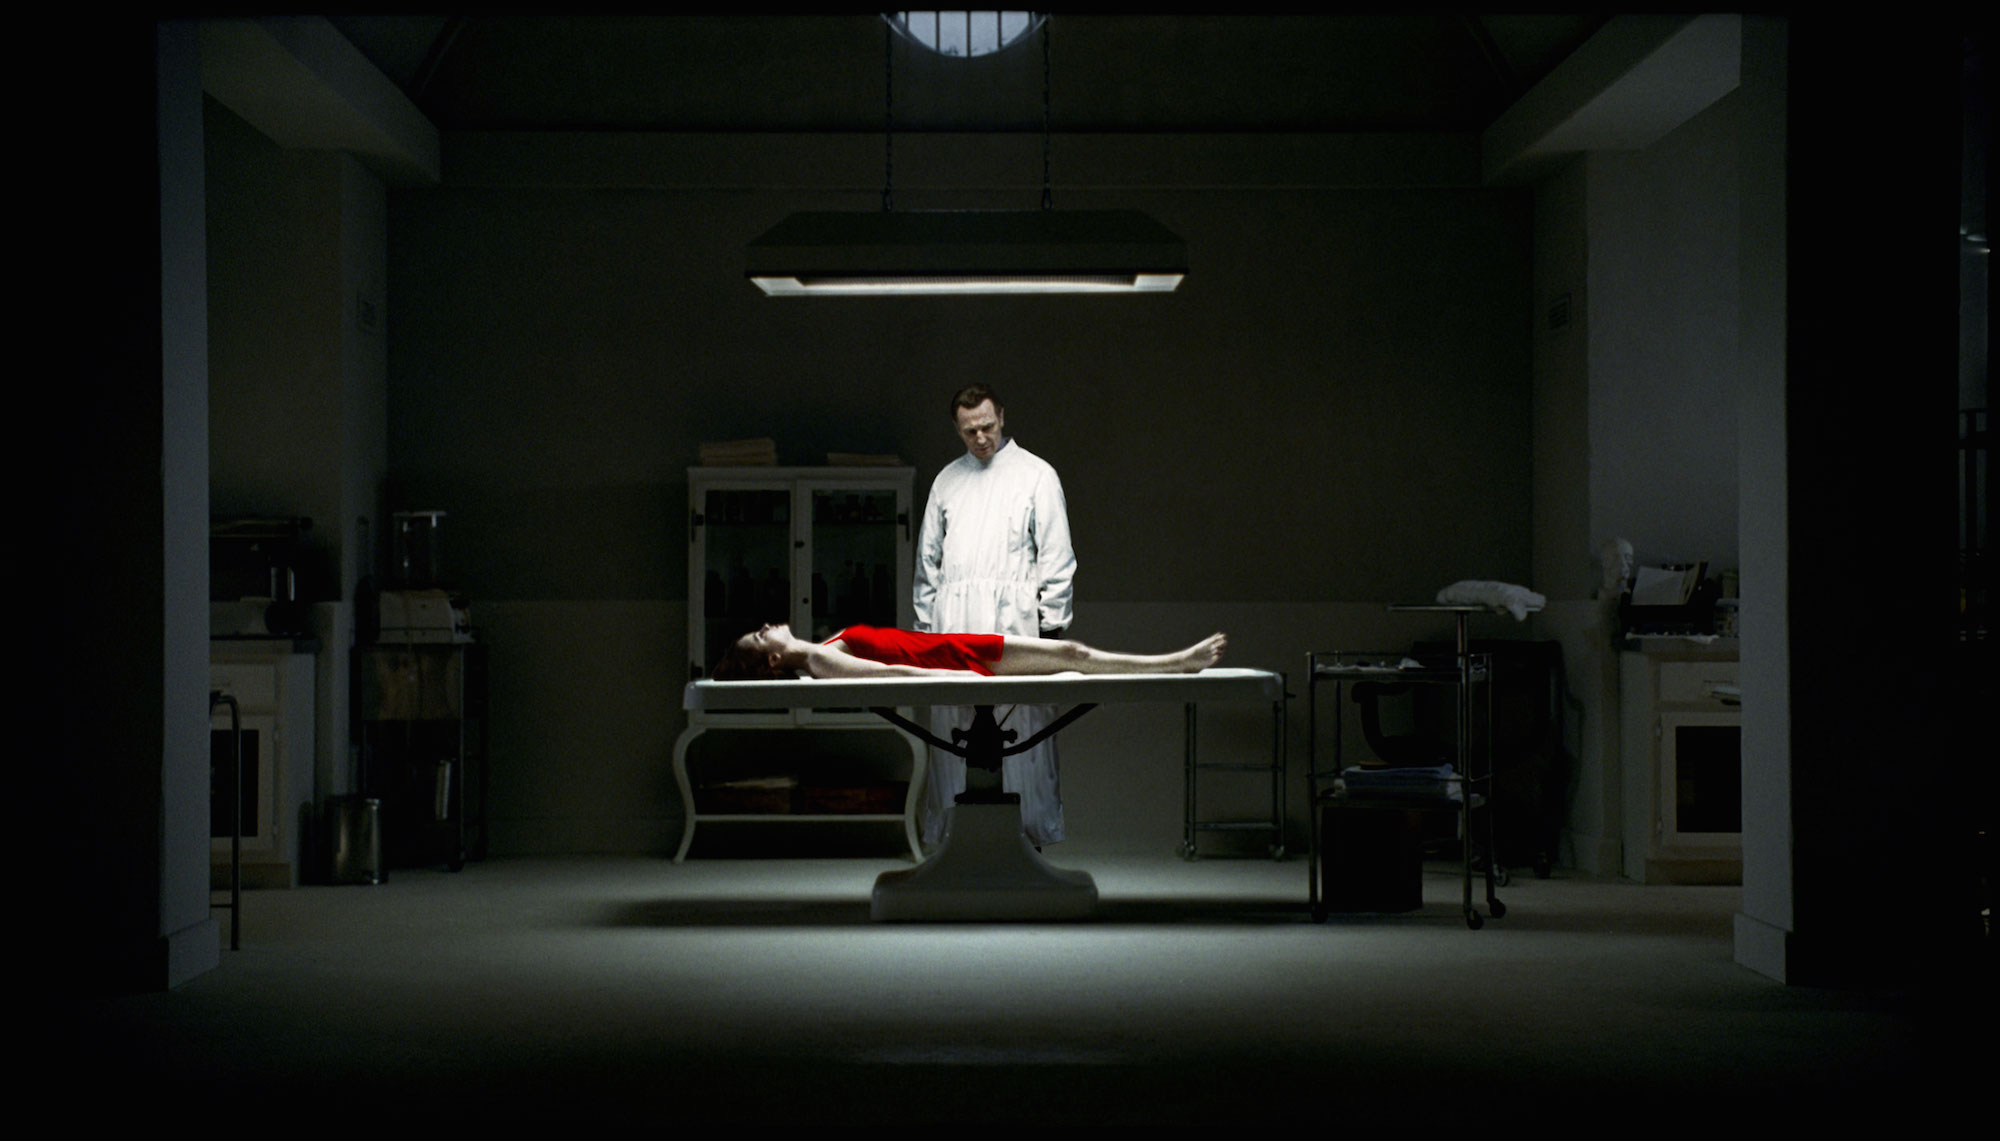 AL-Neeson-Ricci-Prep-Room-1.jpg